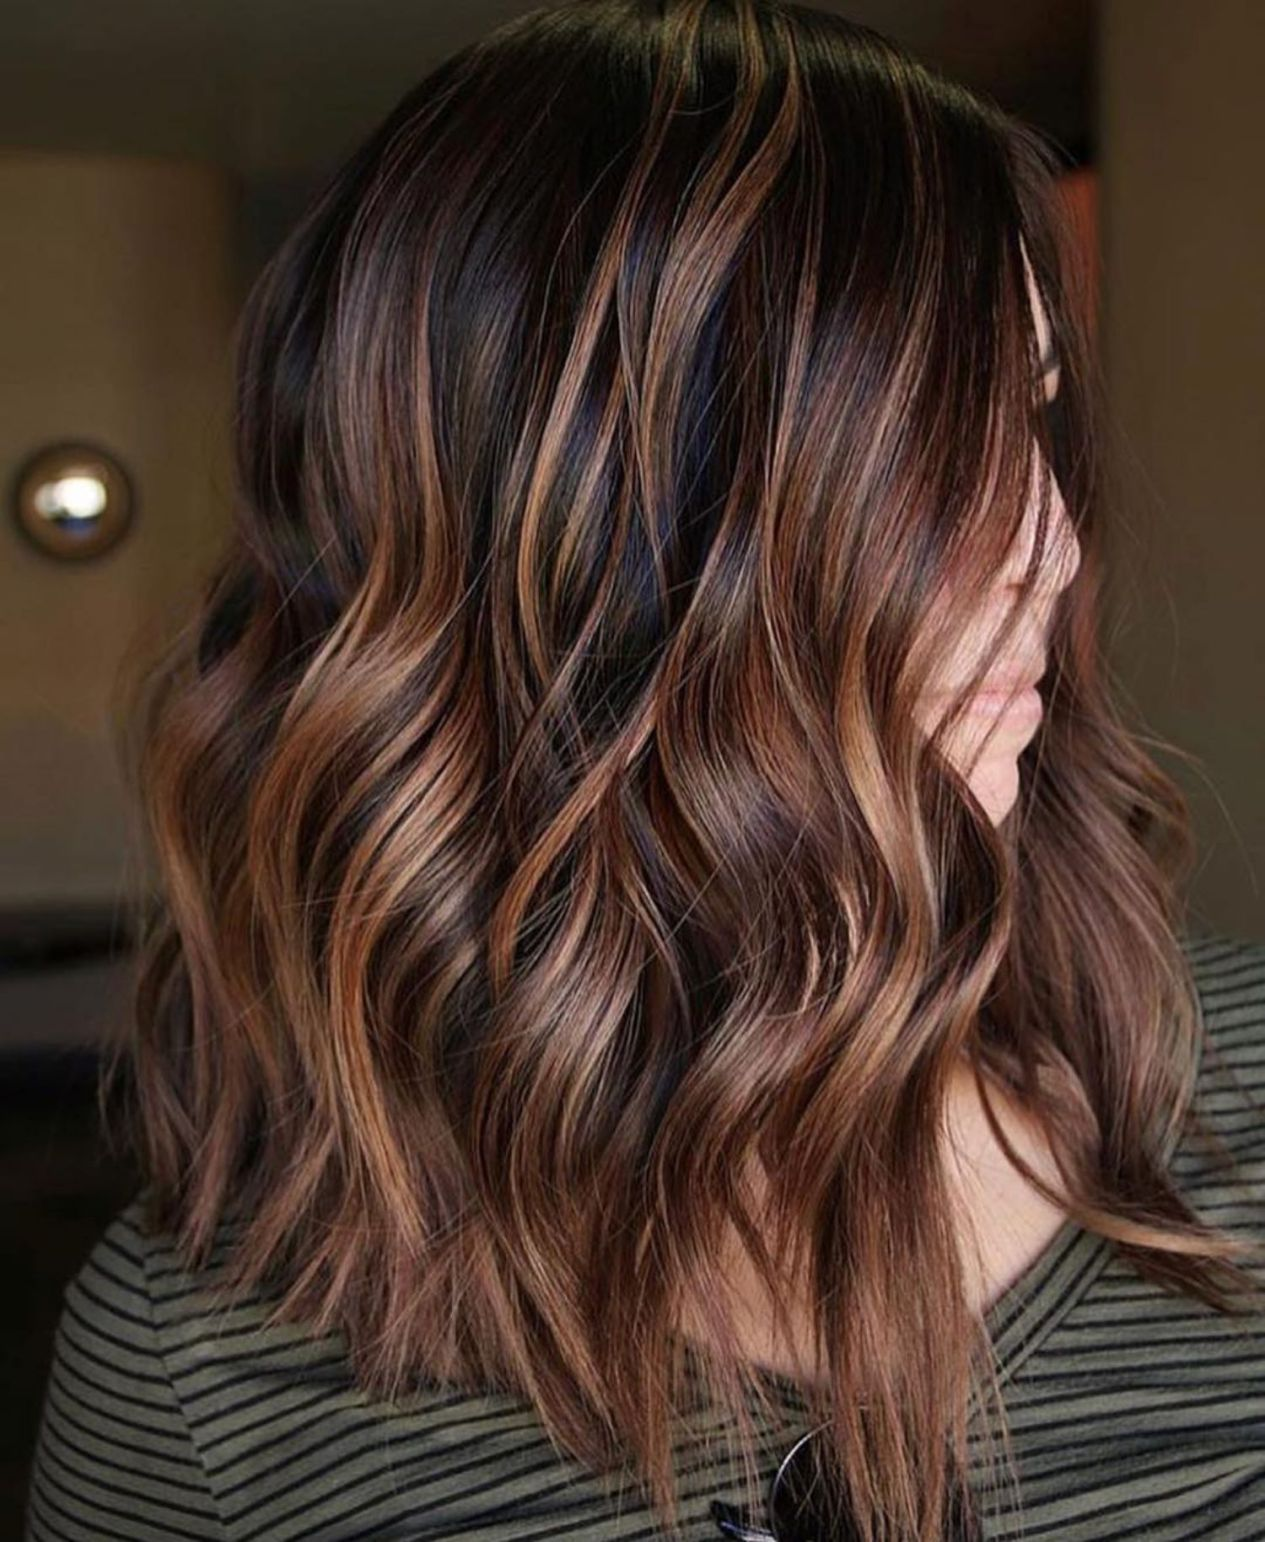 Black Hair With Copper Highlights Hair Styles Dark Brown Hair Color Hair Lengths